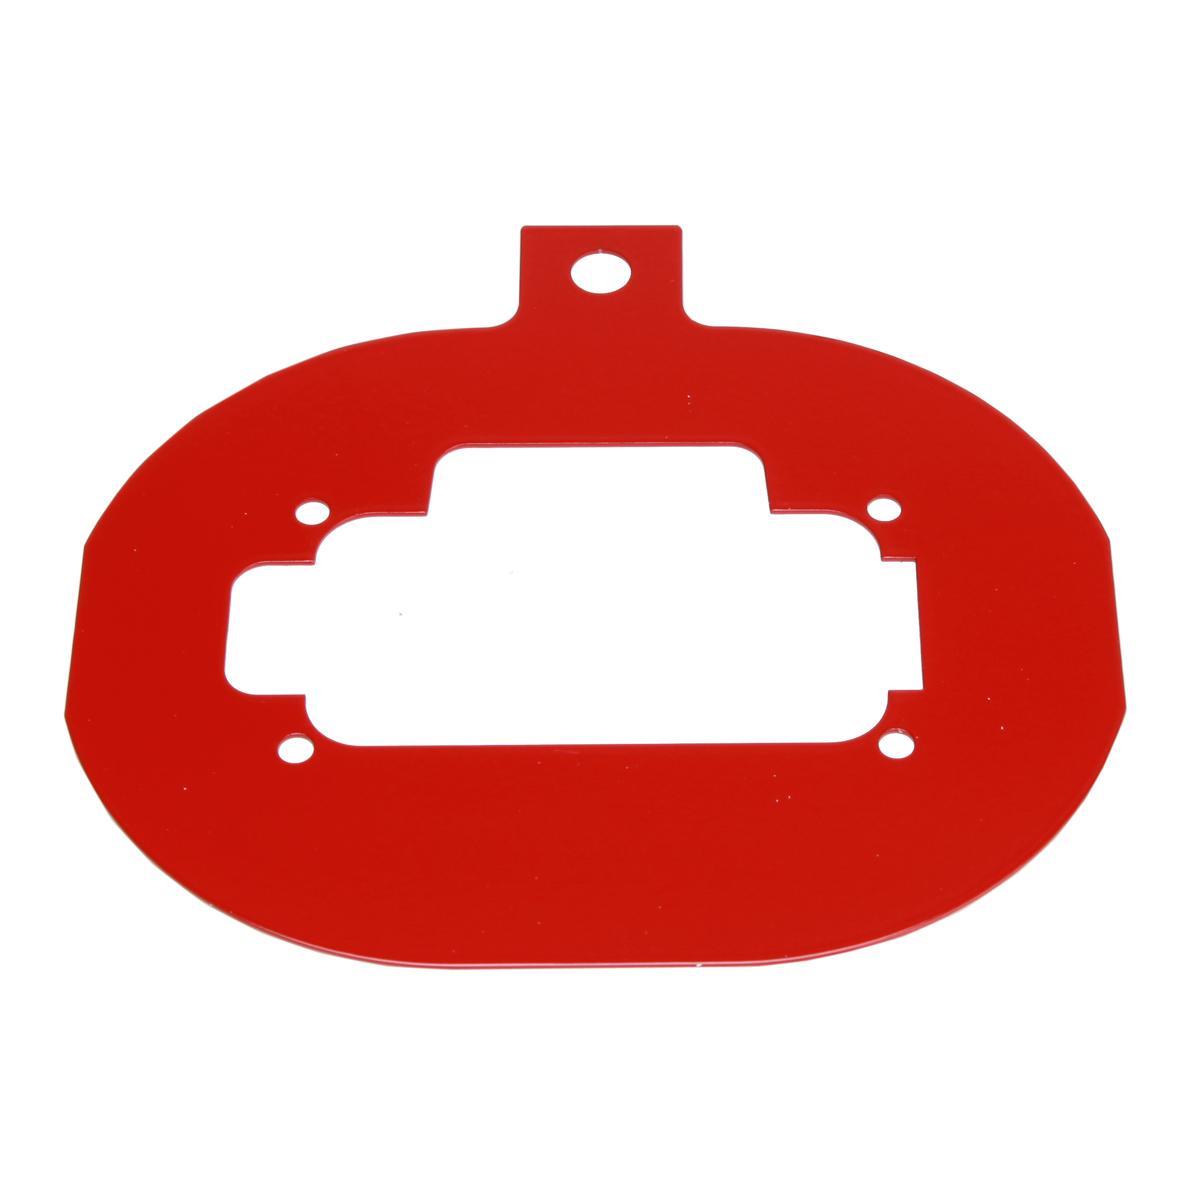 Itg jc20 baseplate 3jc20 from merlin motorsport for Motor base plate design